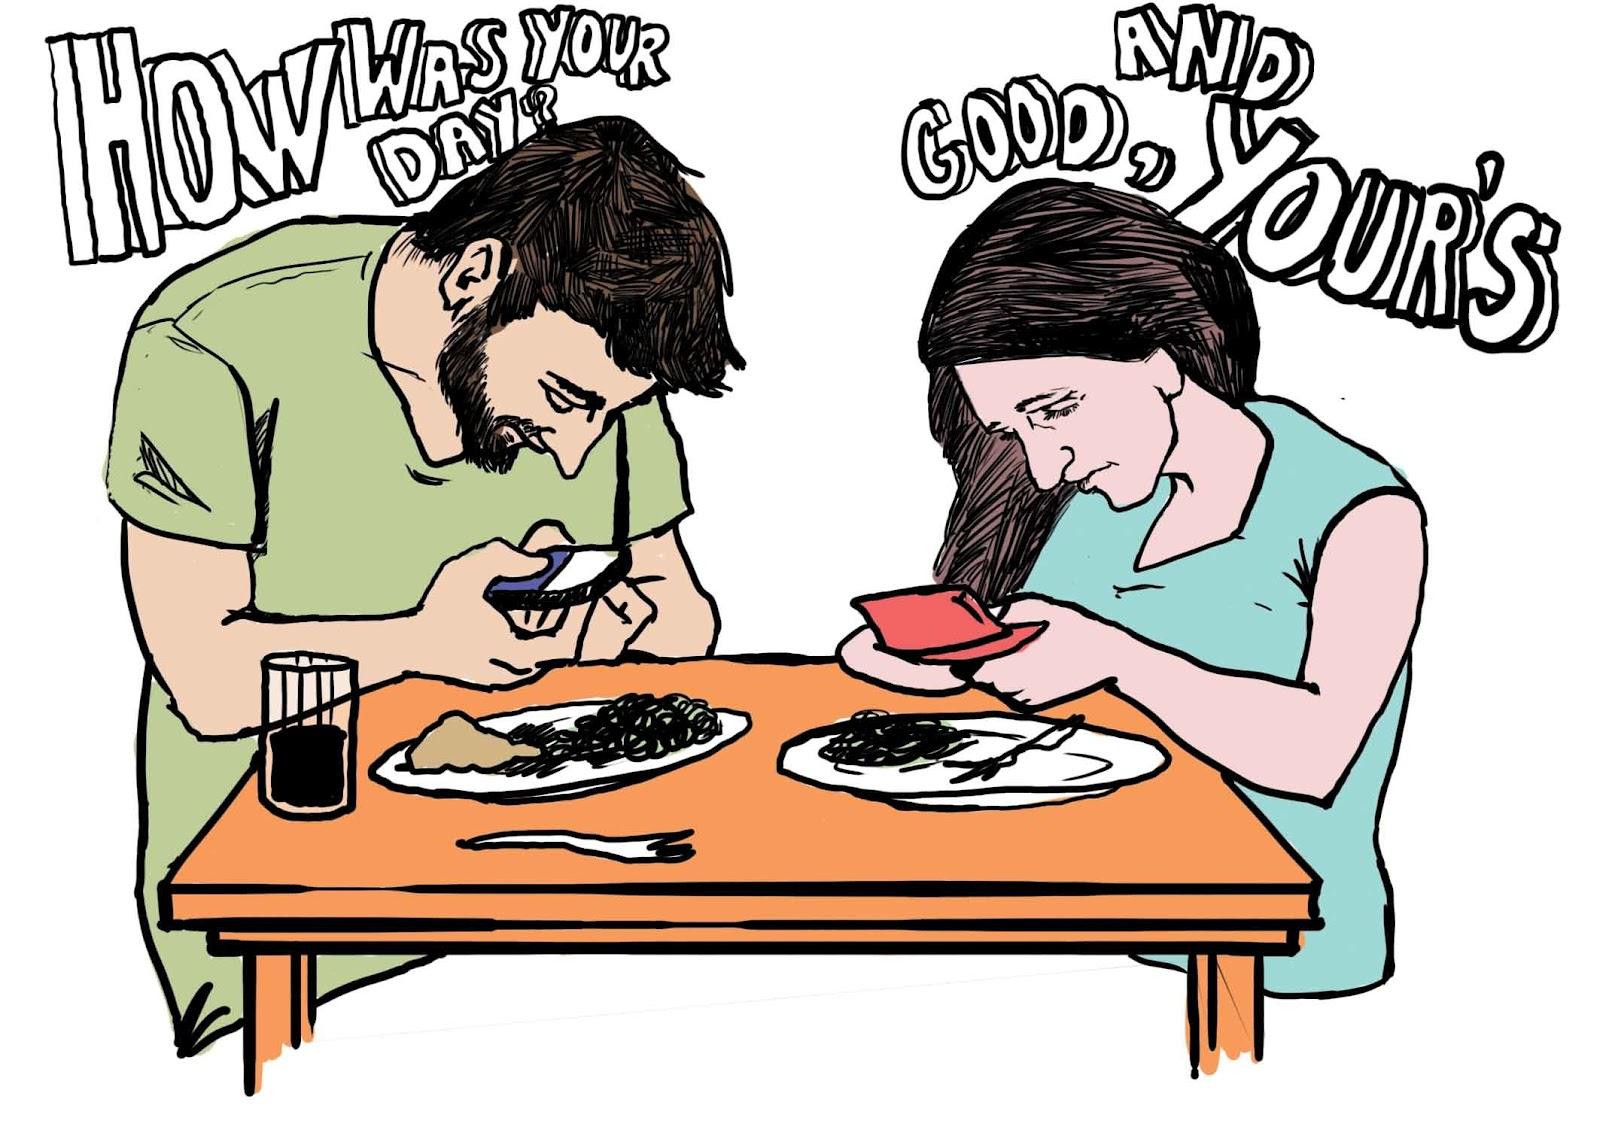 bad communication in relationships